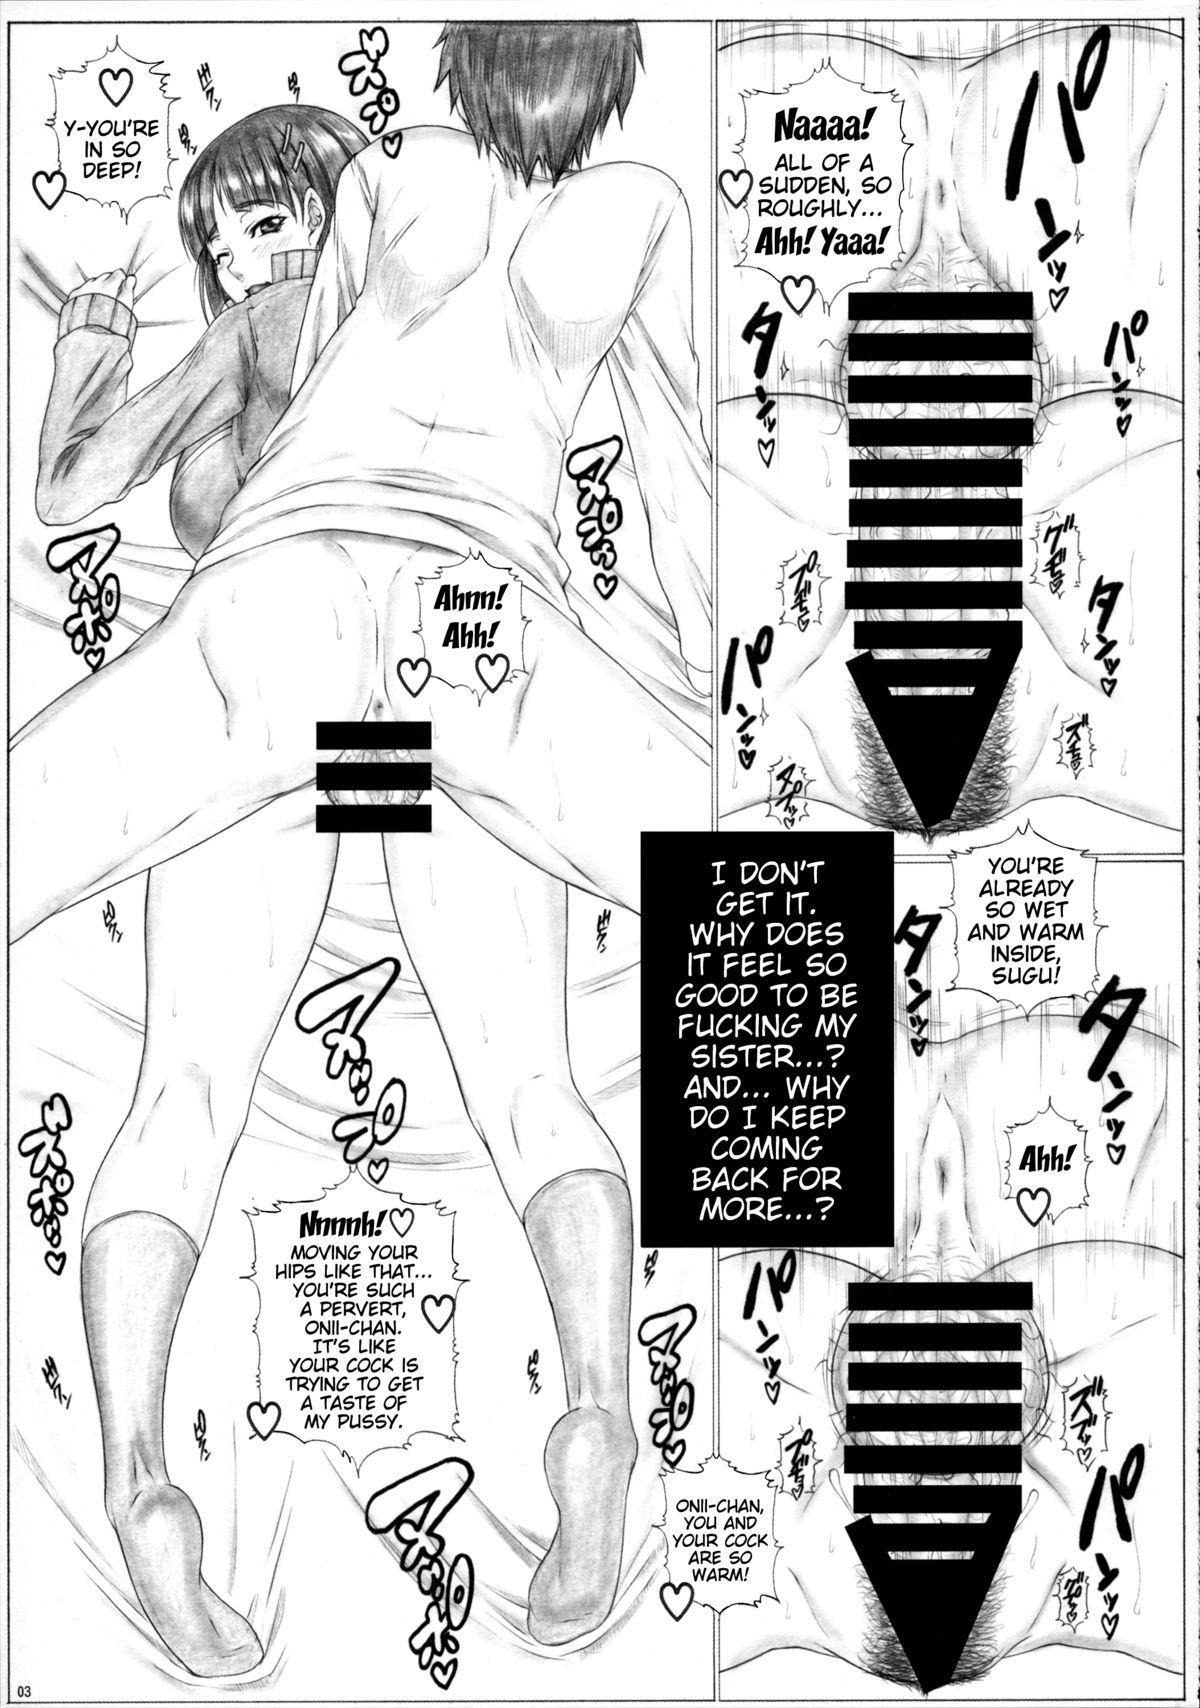 Angel's stroke 81 Suguha Scramble! 2 Oniichan no Seiyoku Kanri | Suguha Scramble! 2 Onii-chan's Libido Management 3